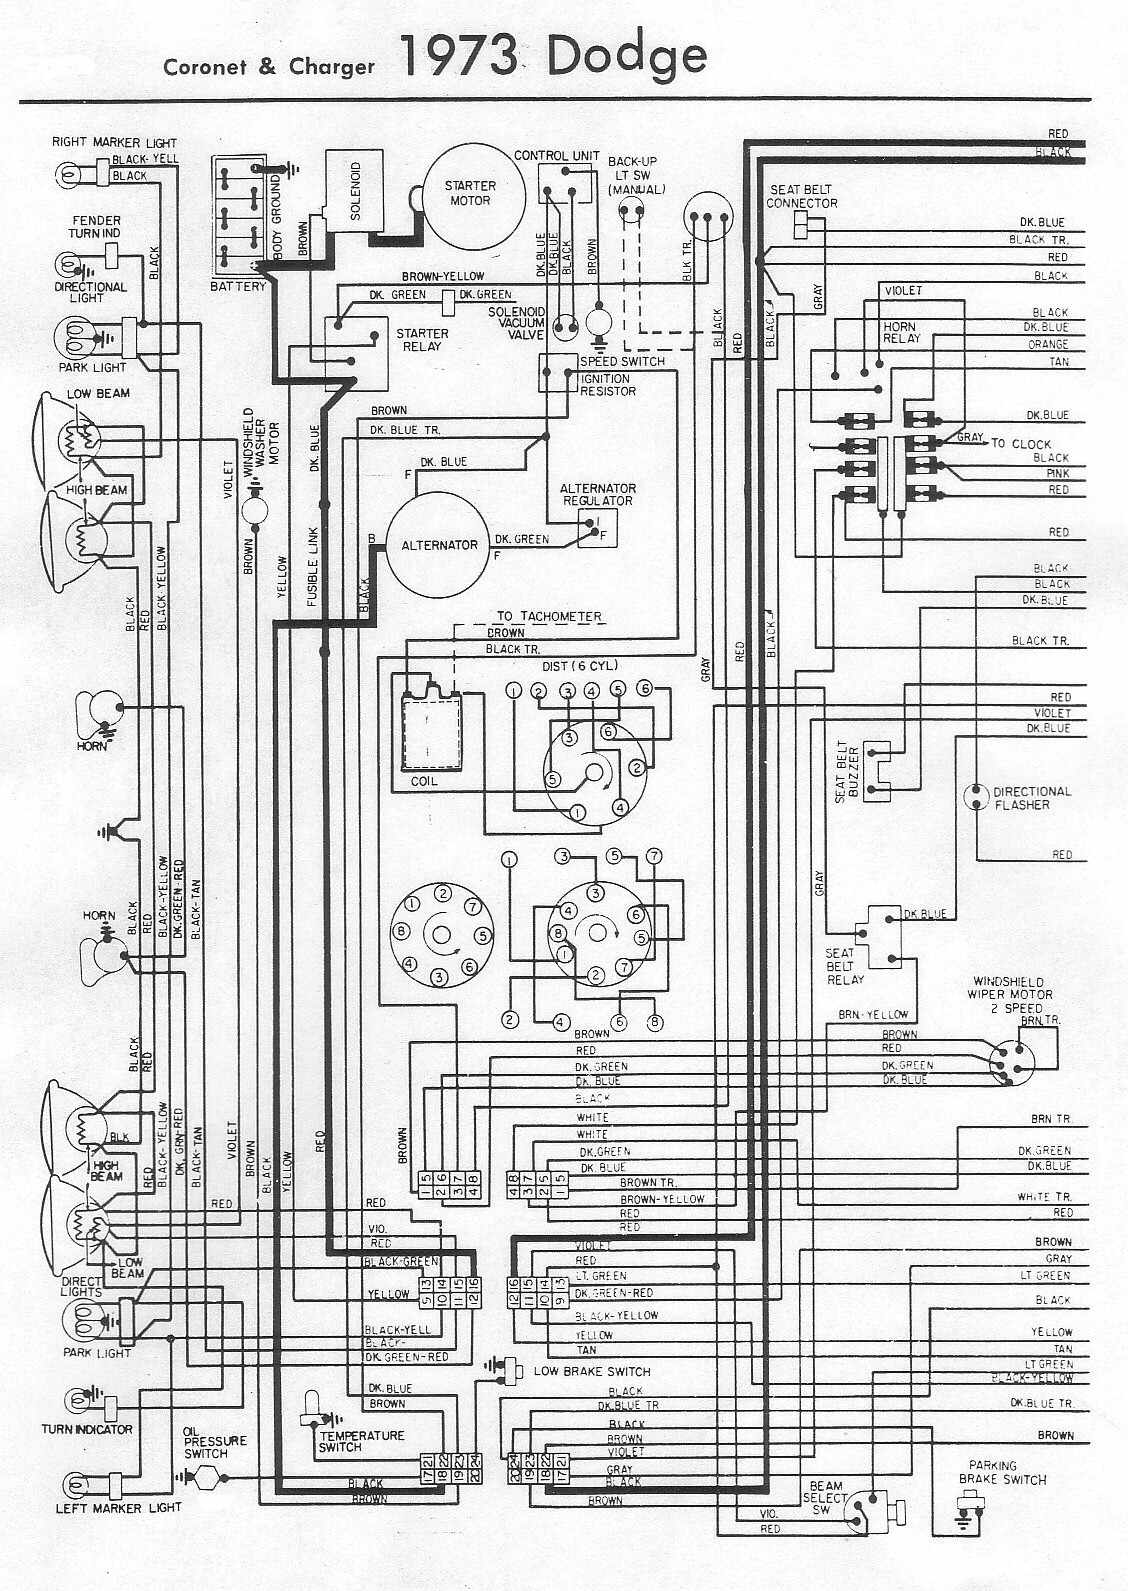 2015 Mopar Wiring Diagrams - Wiring Diagram •